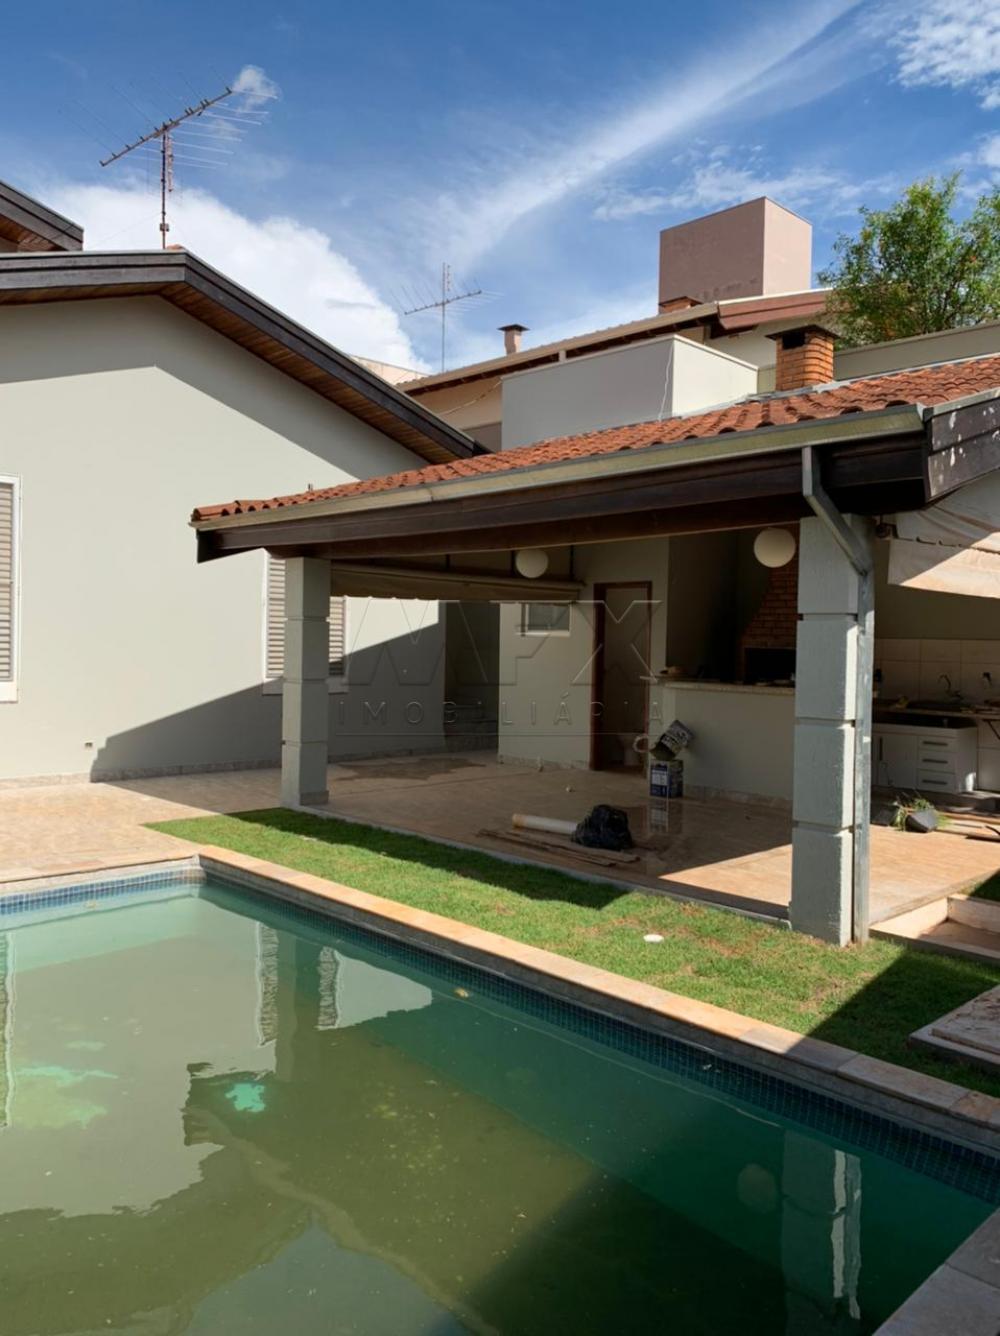 Alugar Casa / Condomínio em Bauru R$ 5.000,00 - Foto 1